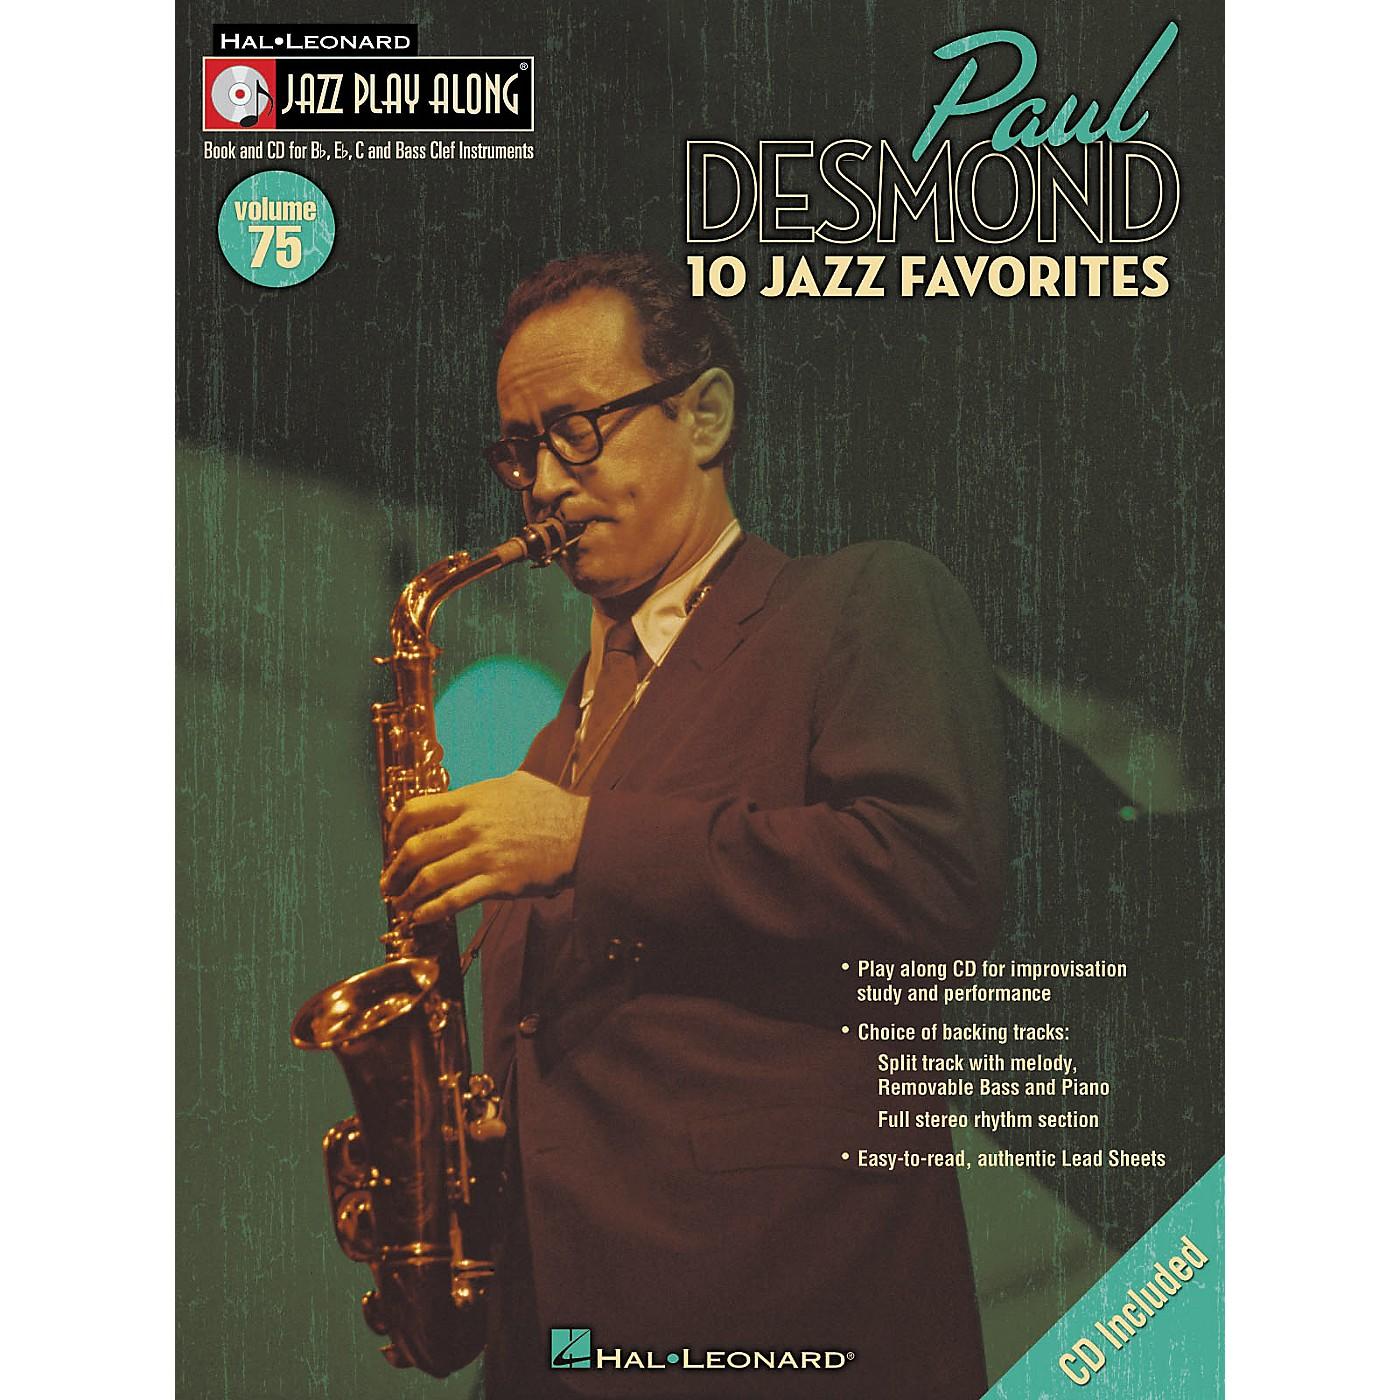 Hal Leonard Paul Desmond Jazz Play-Along Series (Book/CD) thumbnail